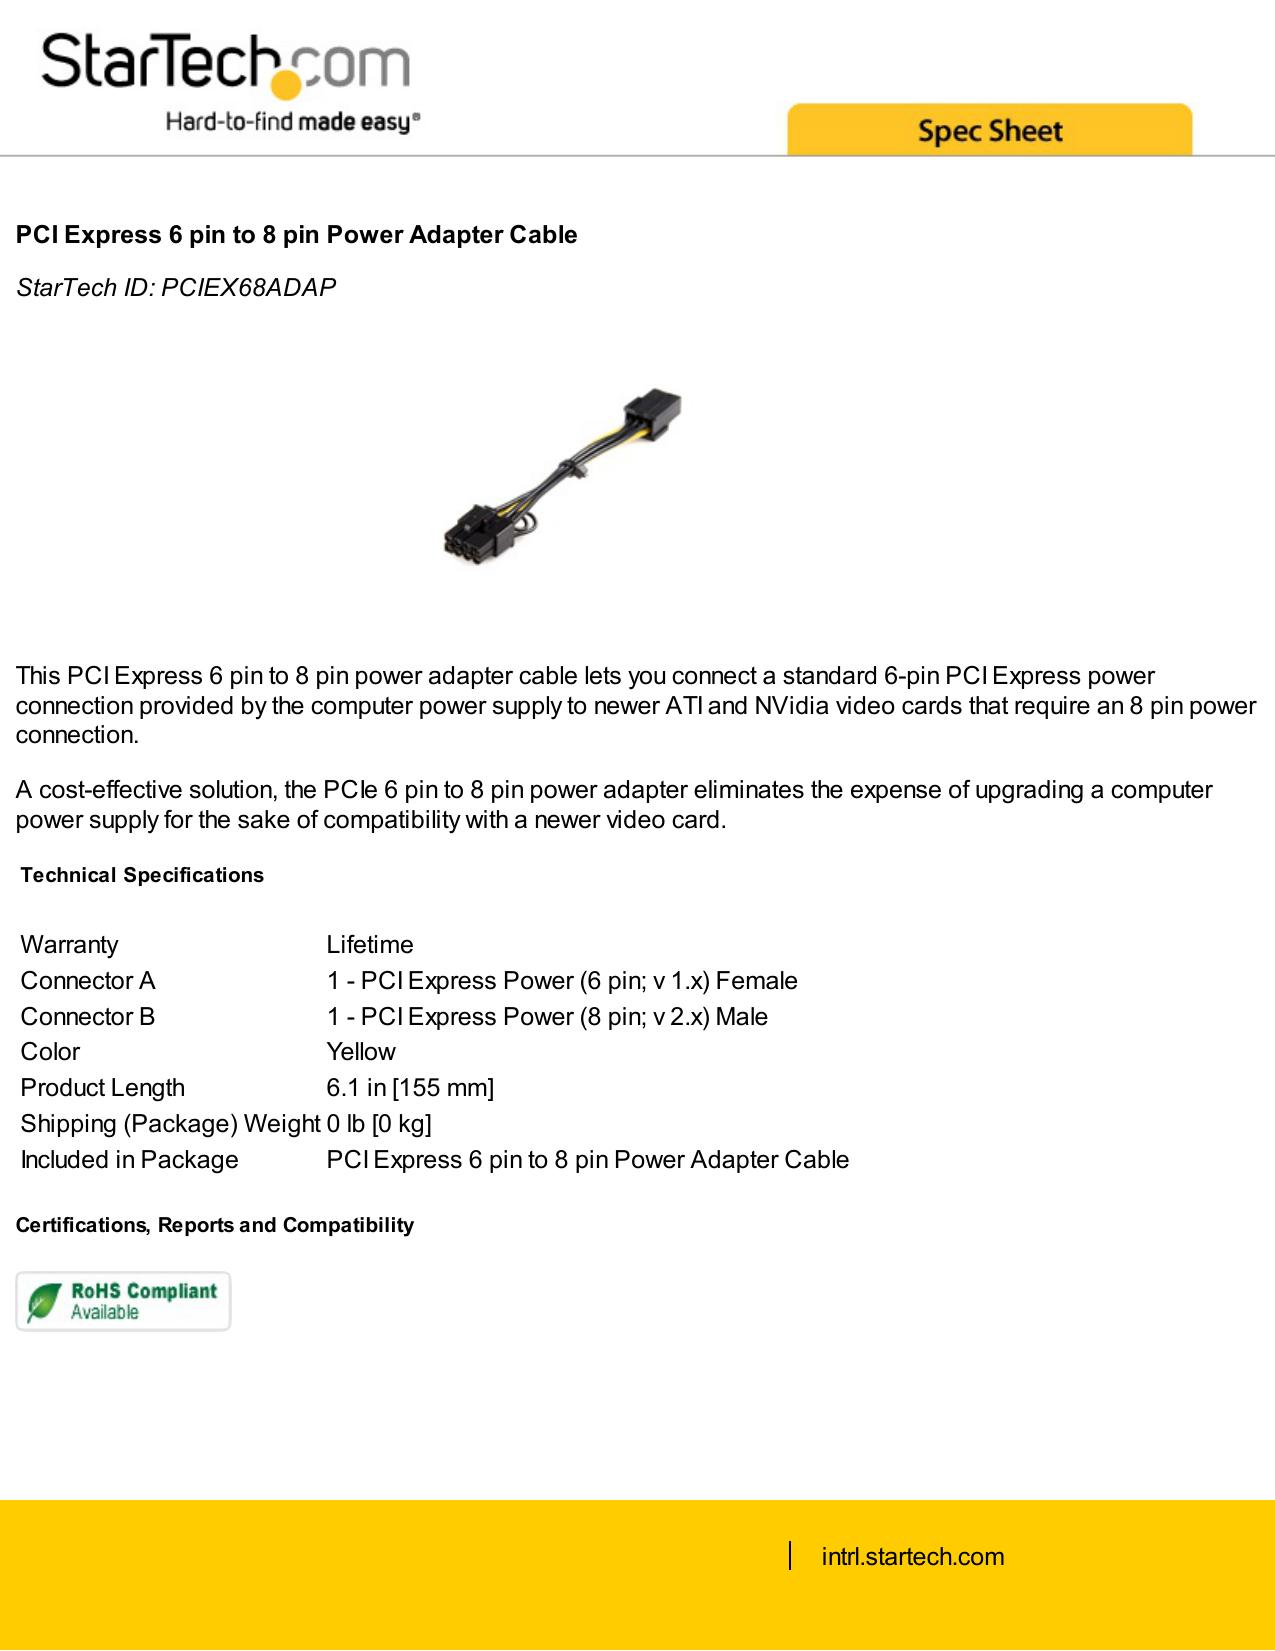 PCIEX68ADAP This PCI Express 6 pin to 8 pin power adapter cable ...